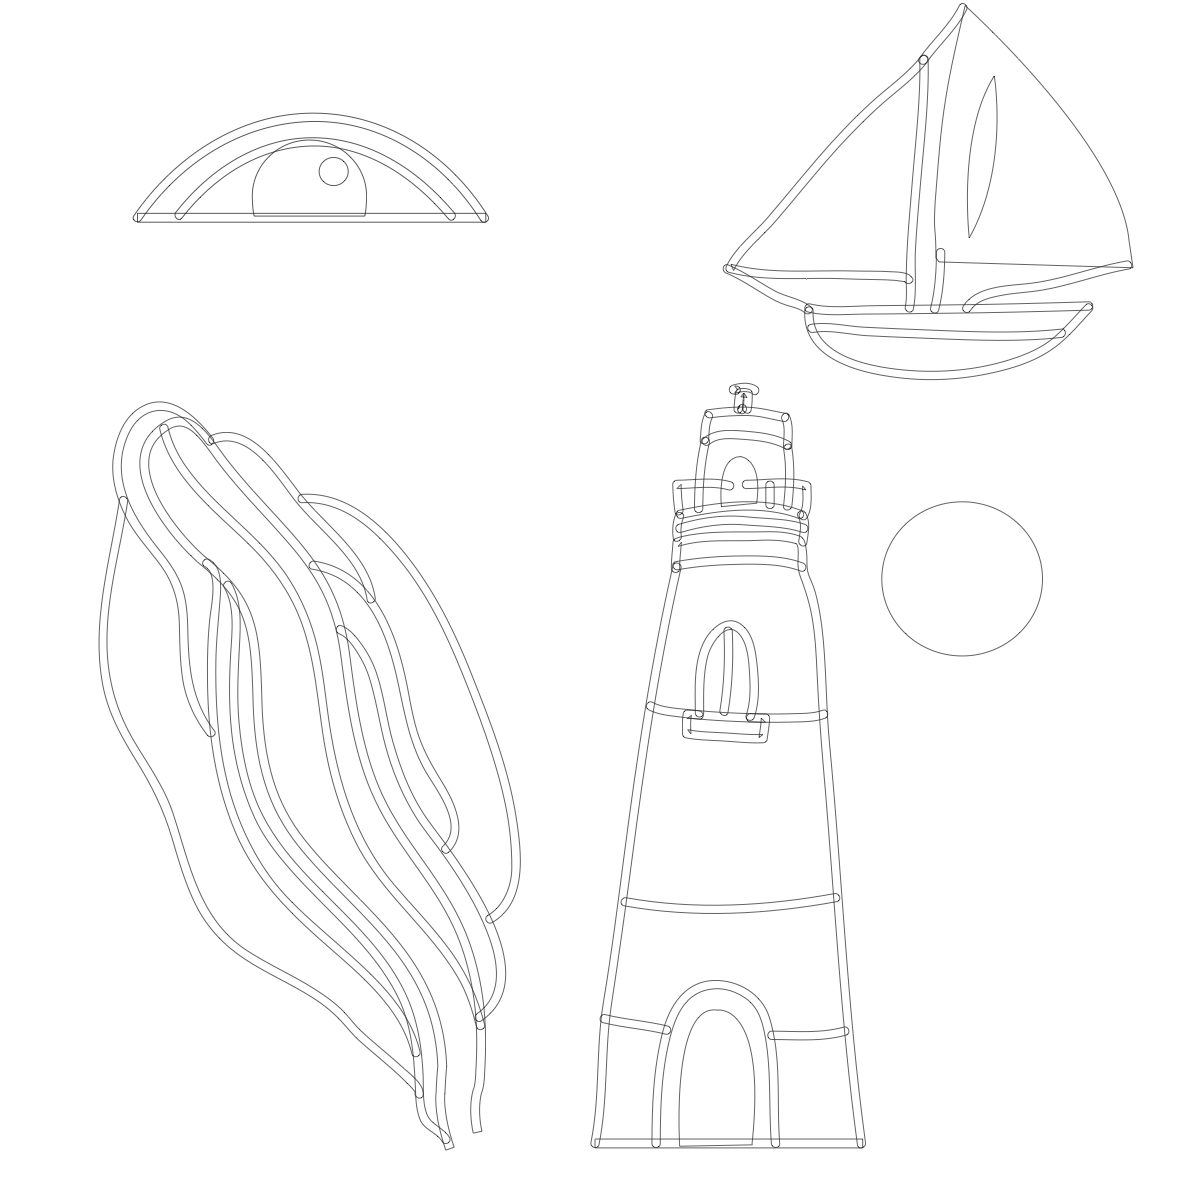 boat elements1 lines.jpg